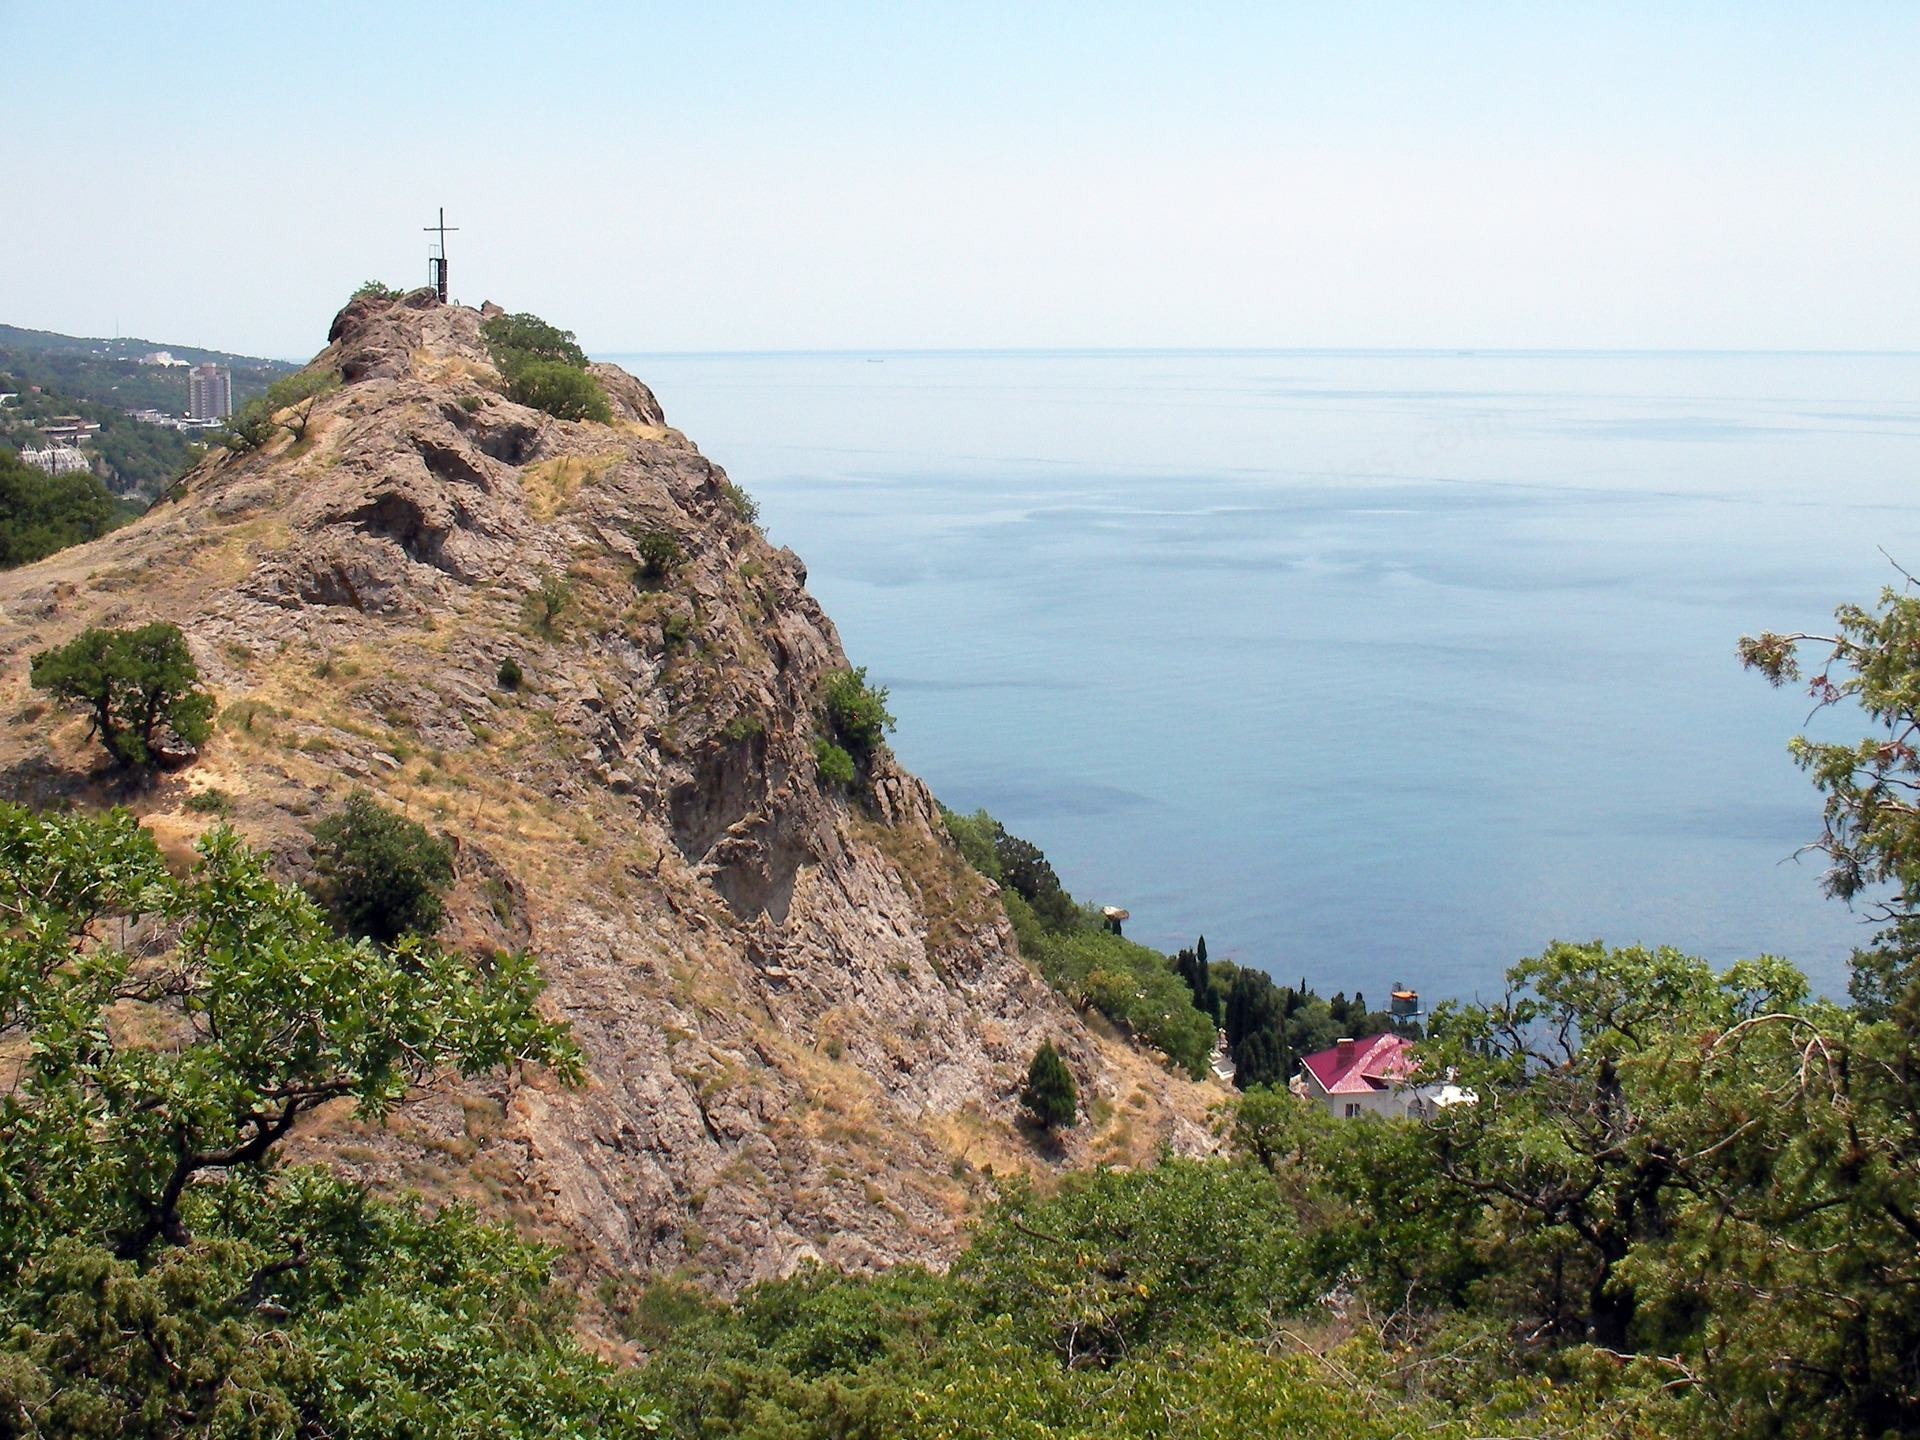 Rock Iphigenia v Kastropol